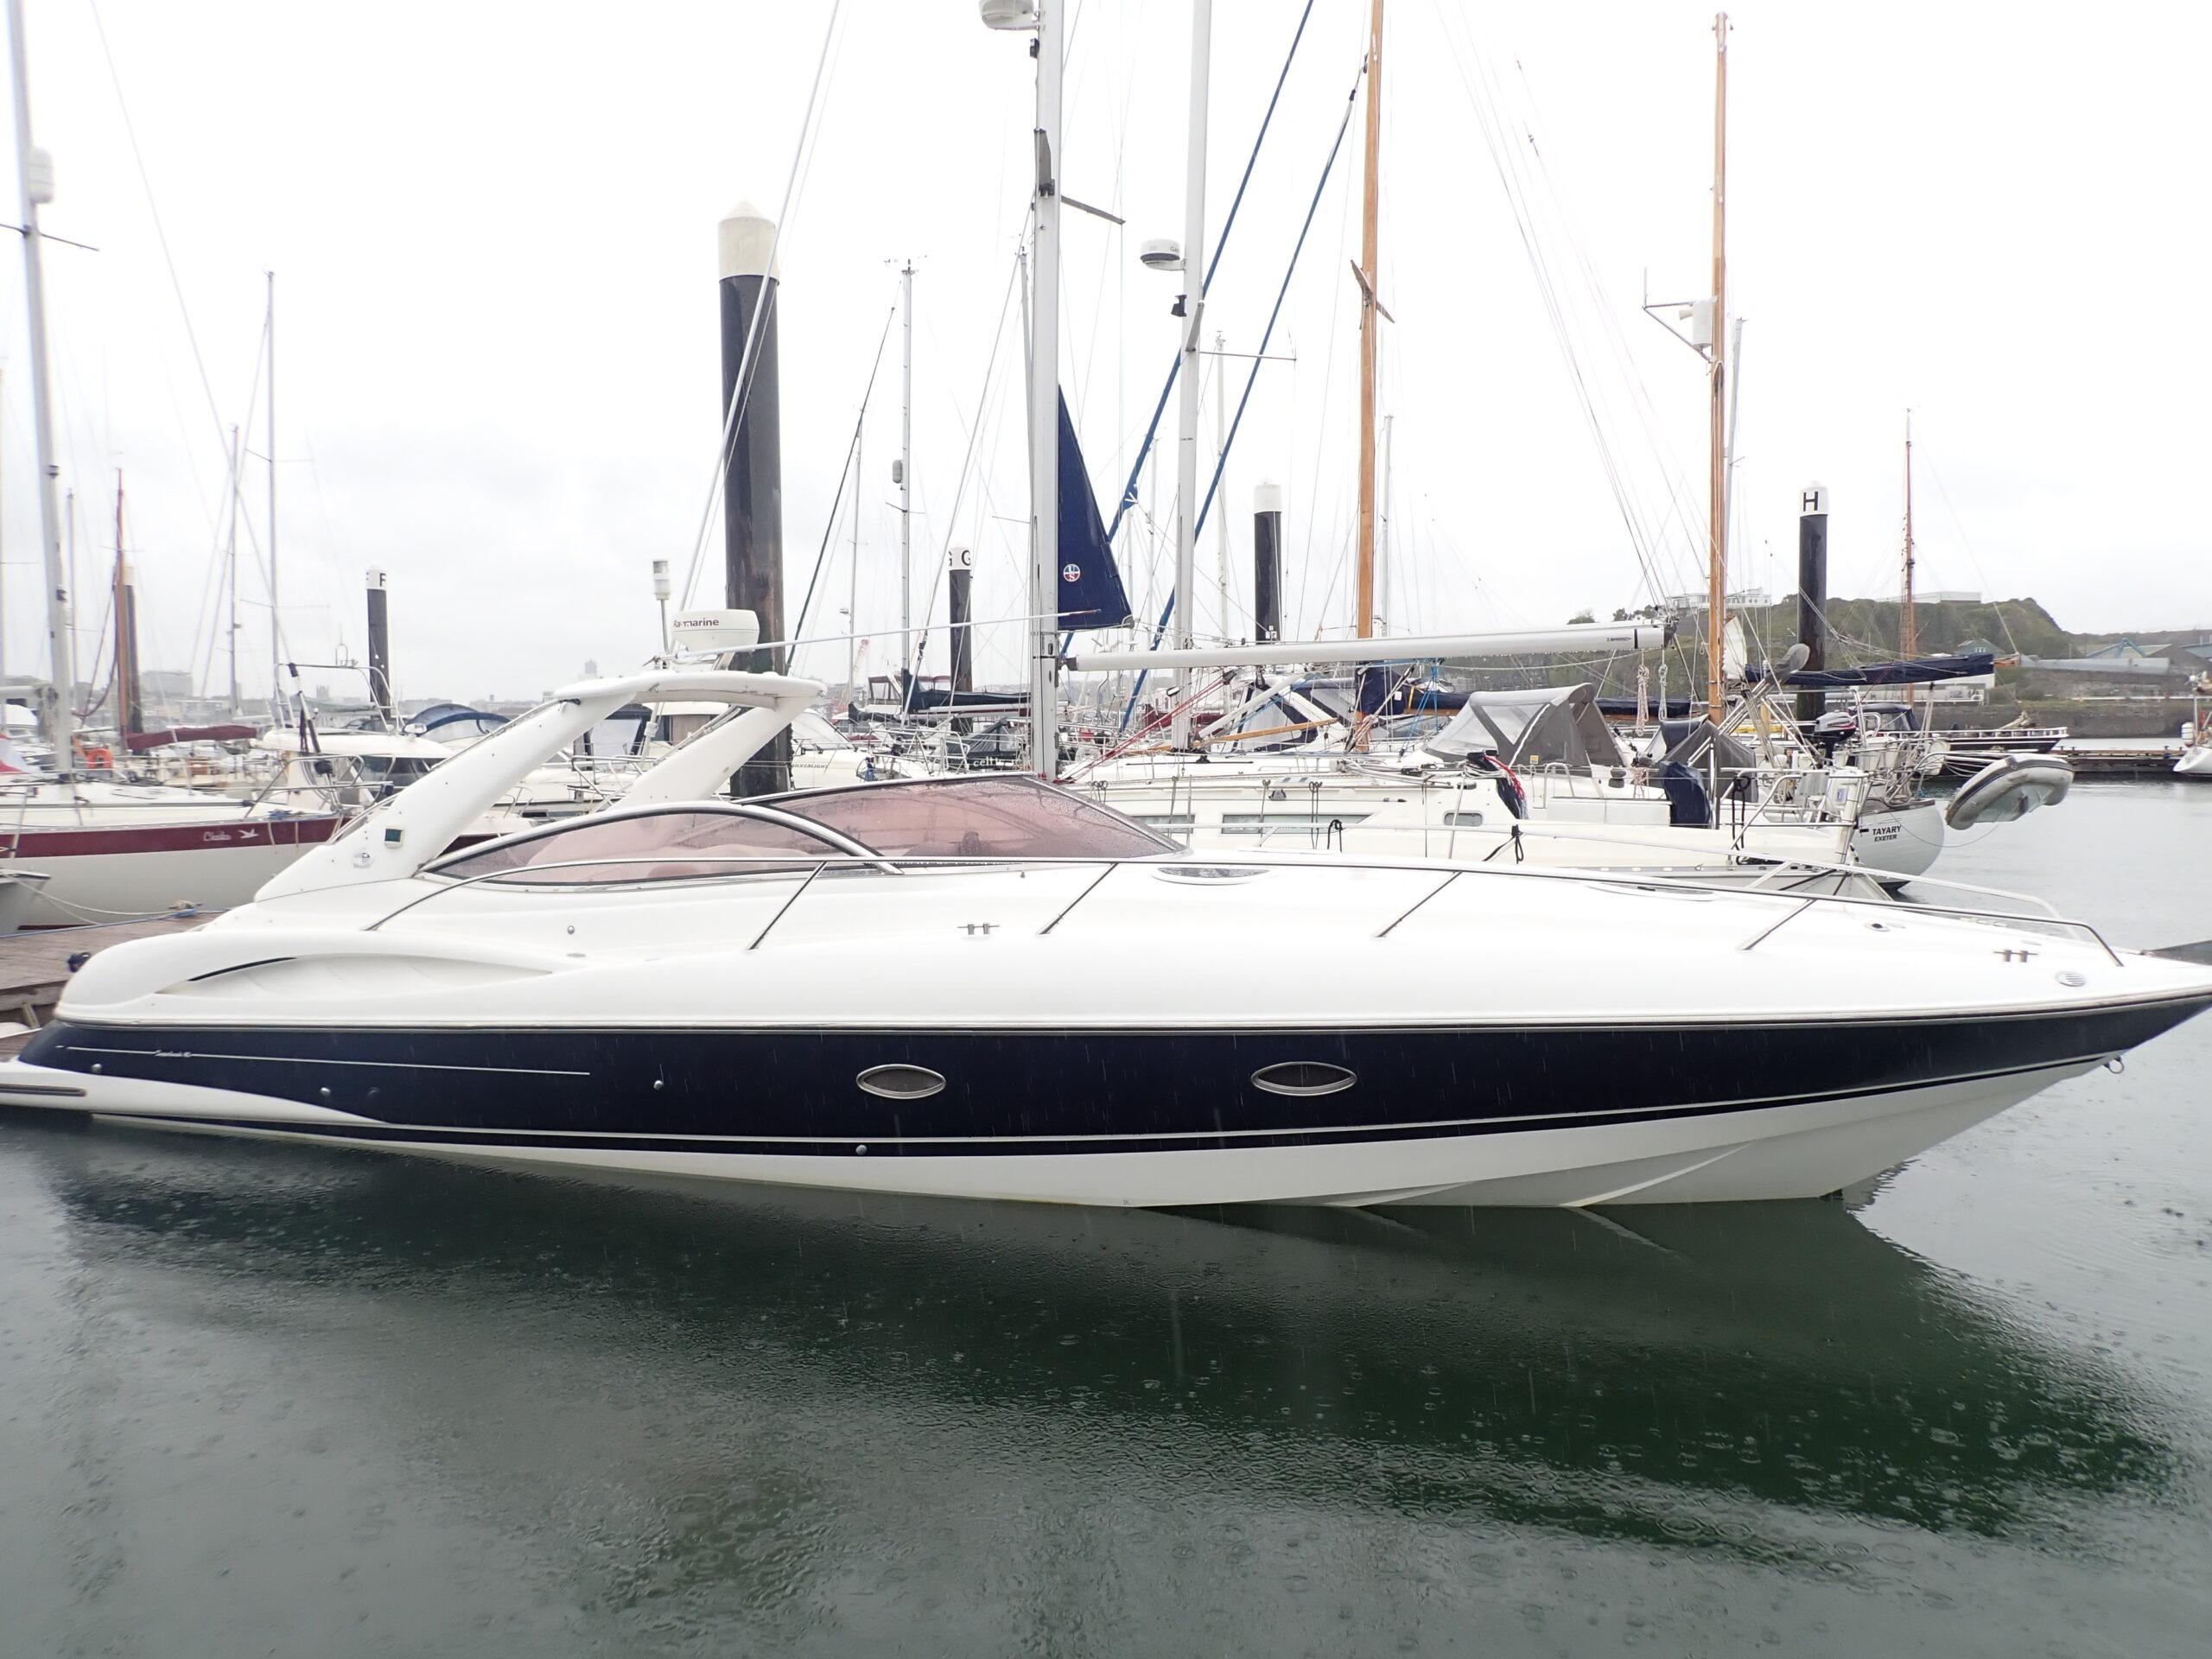 Survey of Calypso - A 2004 Sunseeker Super Hawk 40 at Plymouth Yacht Haven in Devon